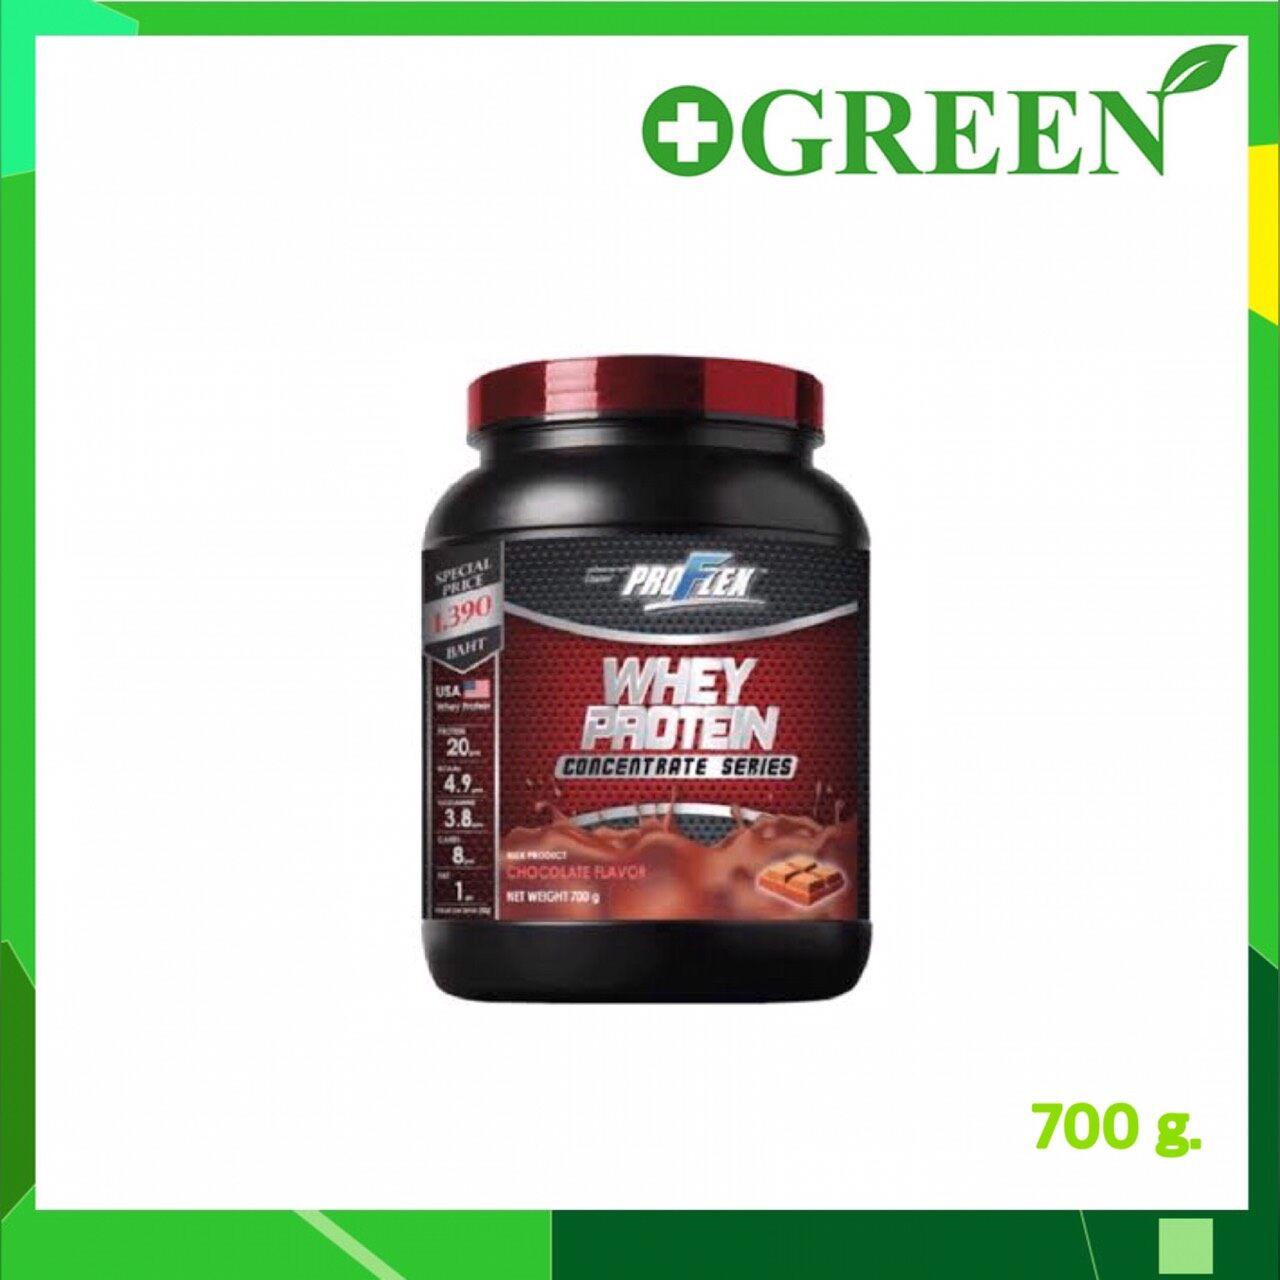 EXP 150421 Proflex Whey Protein Concentrate Chocolate 700 G โปรเฟล็กซ์ เวย์โปรตีน คอนเซนเตรท รสช็อคโกแลต ขนาด 700 กรัม